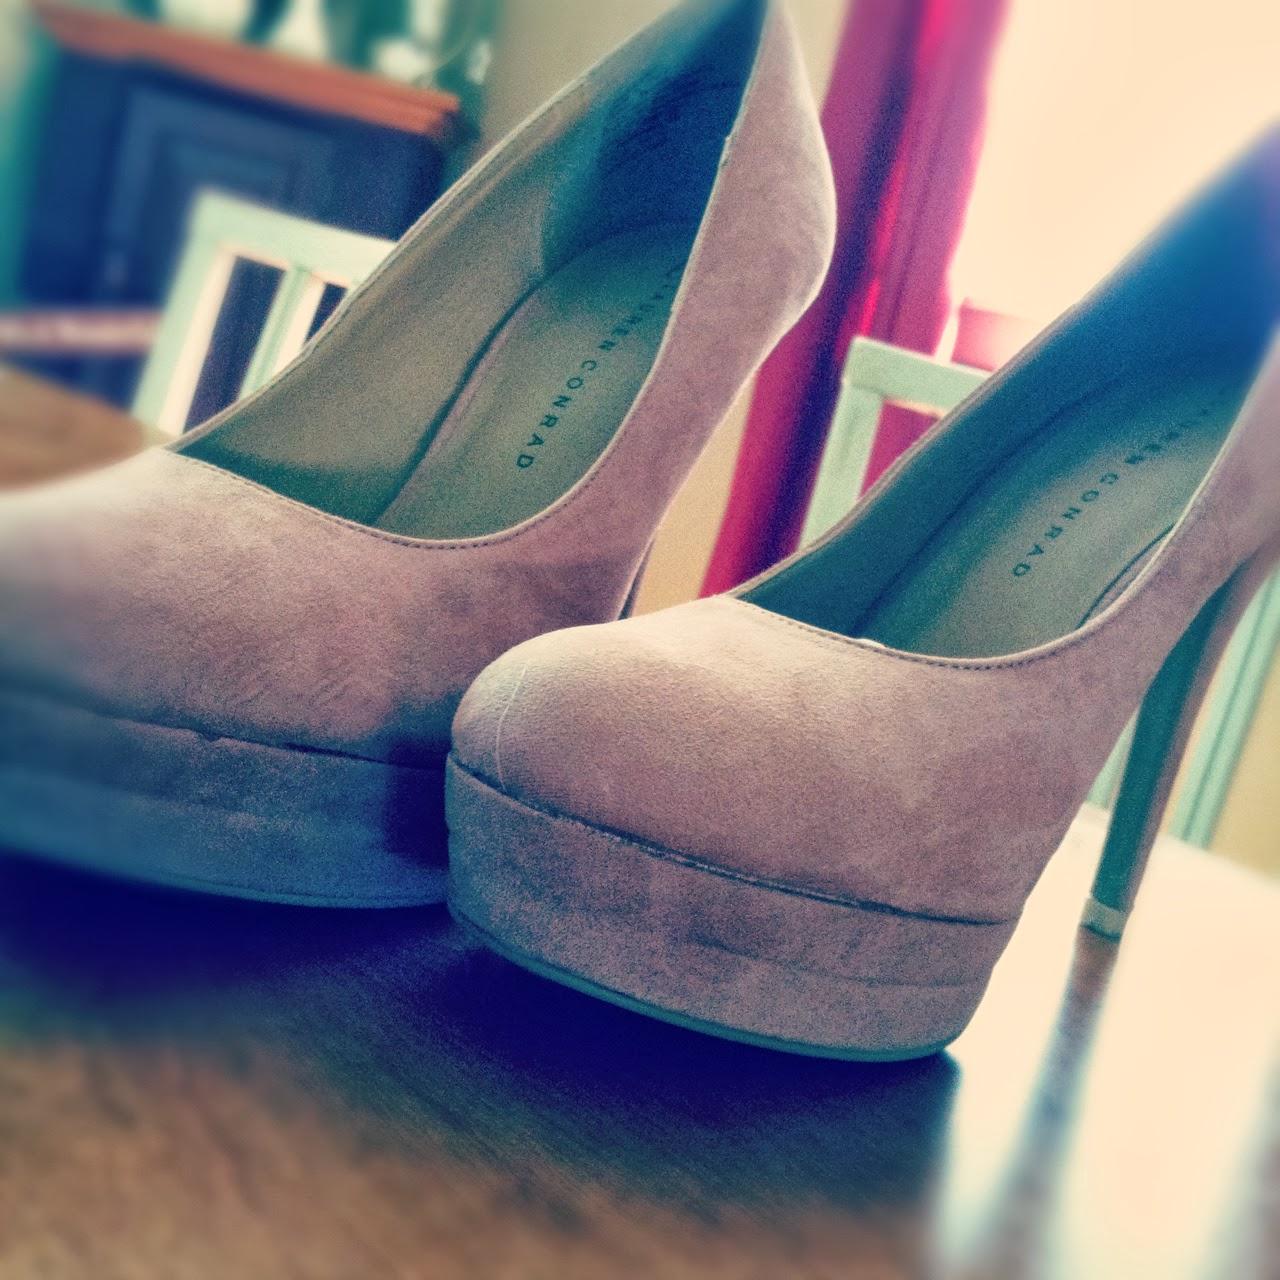 Zapatos Casuales para cada dia